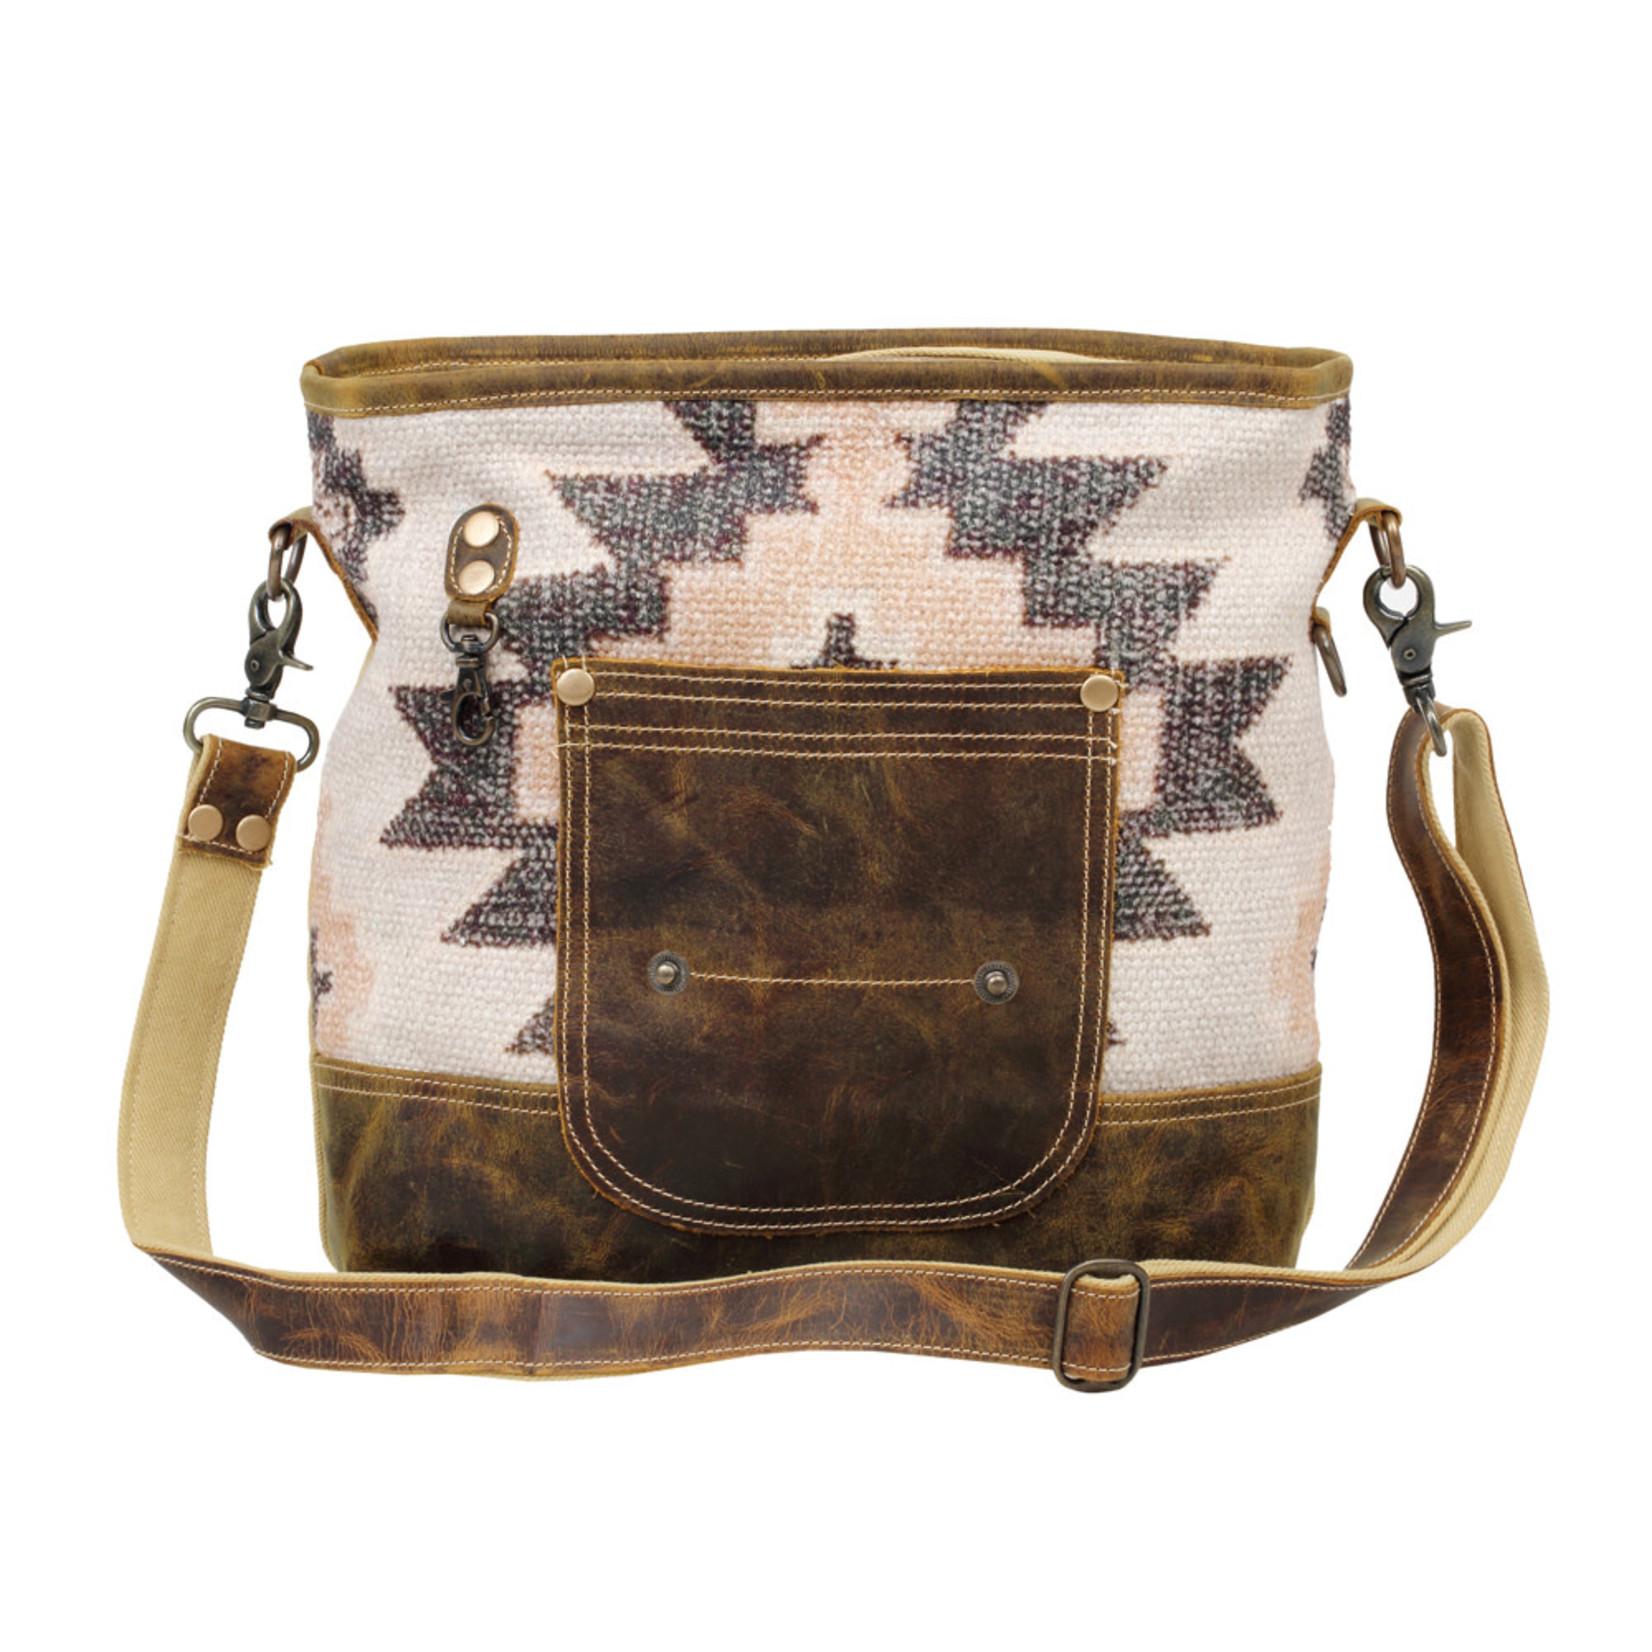 Myra Bags S-2597 Cool Shoulder Bag